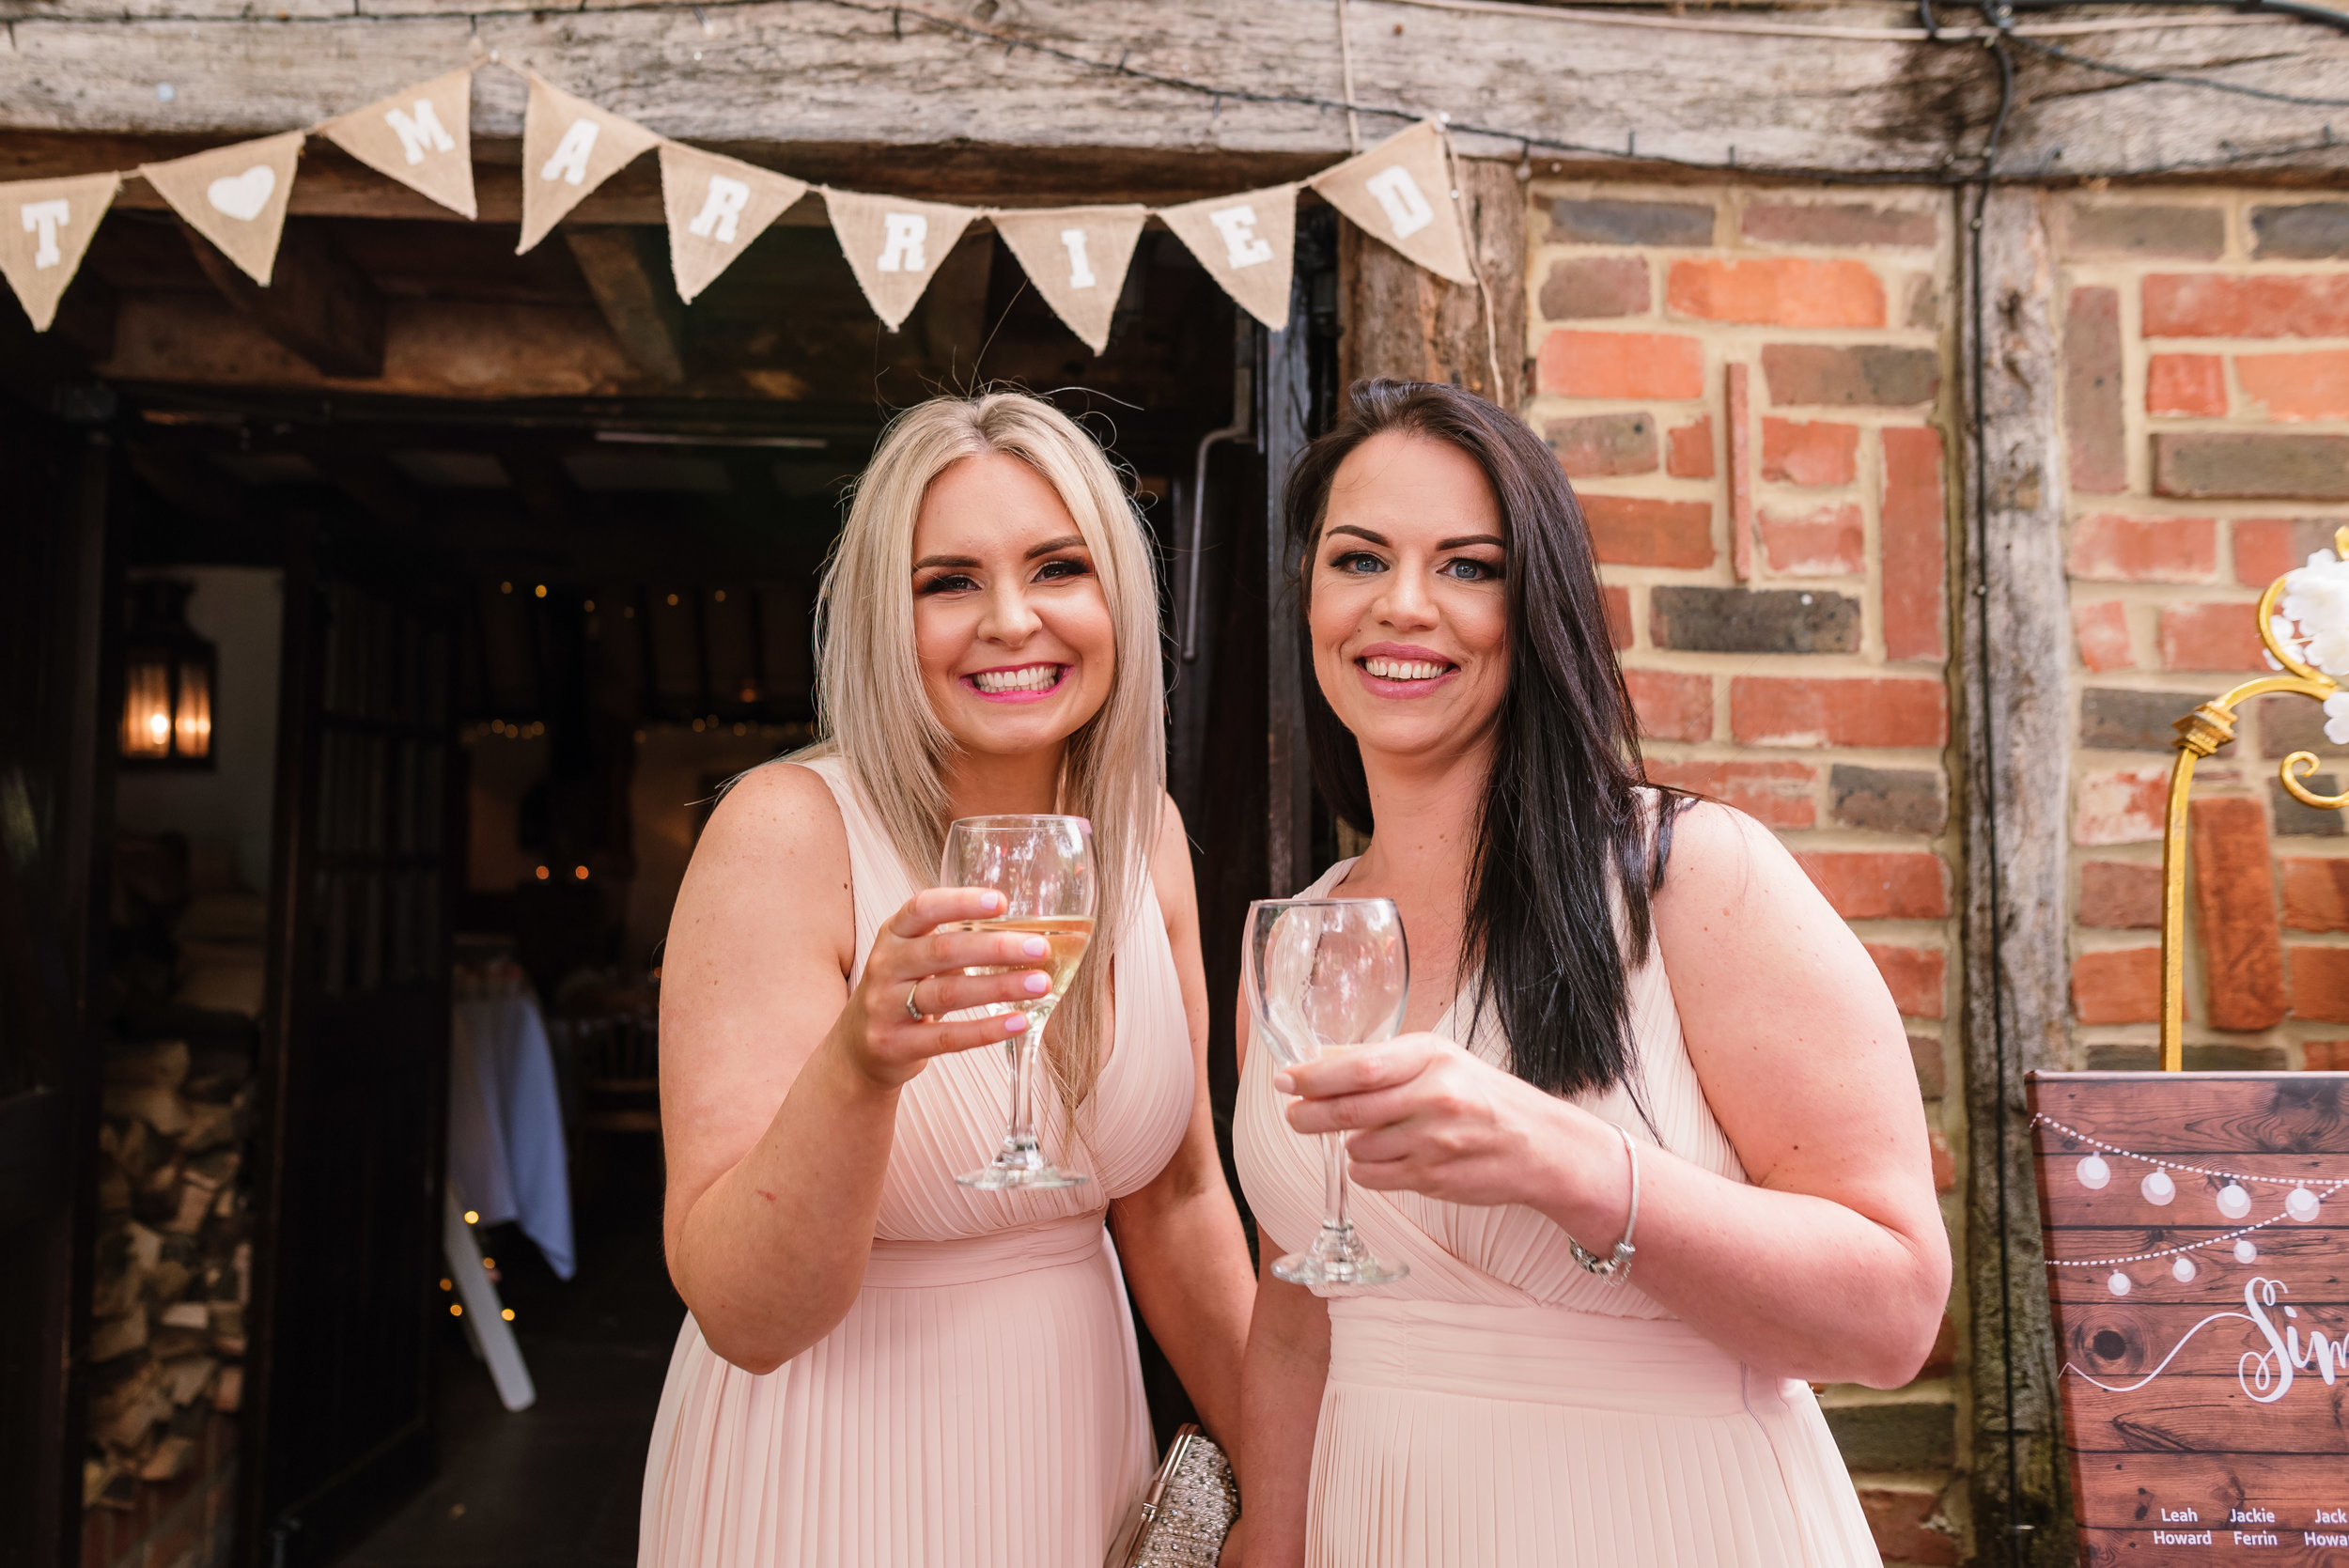 Sarah-Fishlock-Photography : Hampshire-wedding-photographer-hampshire : fleet-wedding-photographer-fleet : Meade-Hall-Wedding-Photographer : Meade-Hall-Wedding-Photos-660.jpg